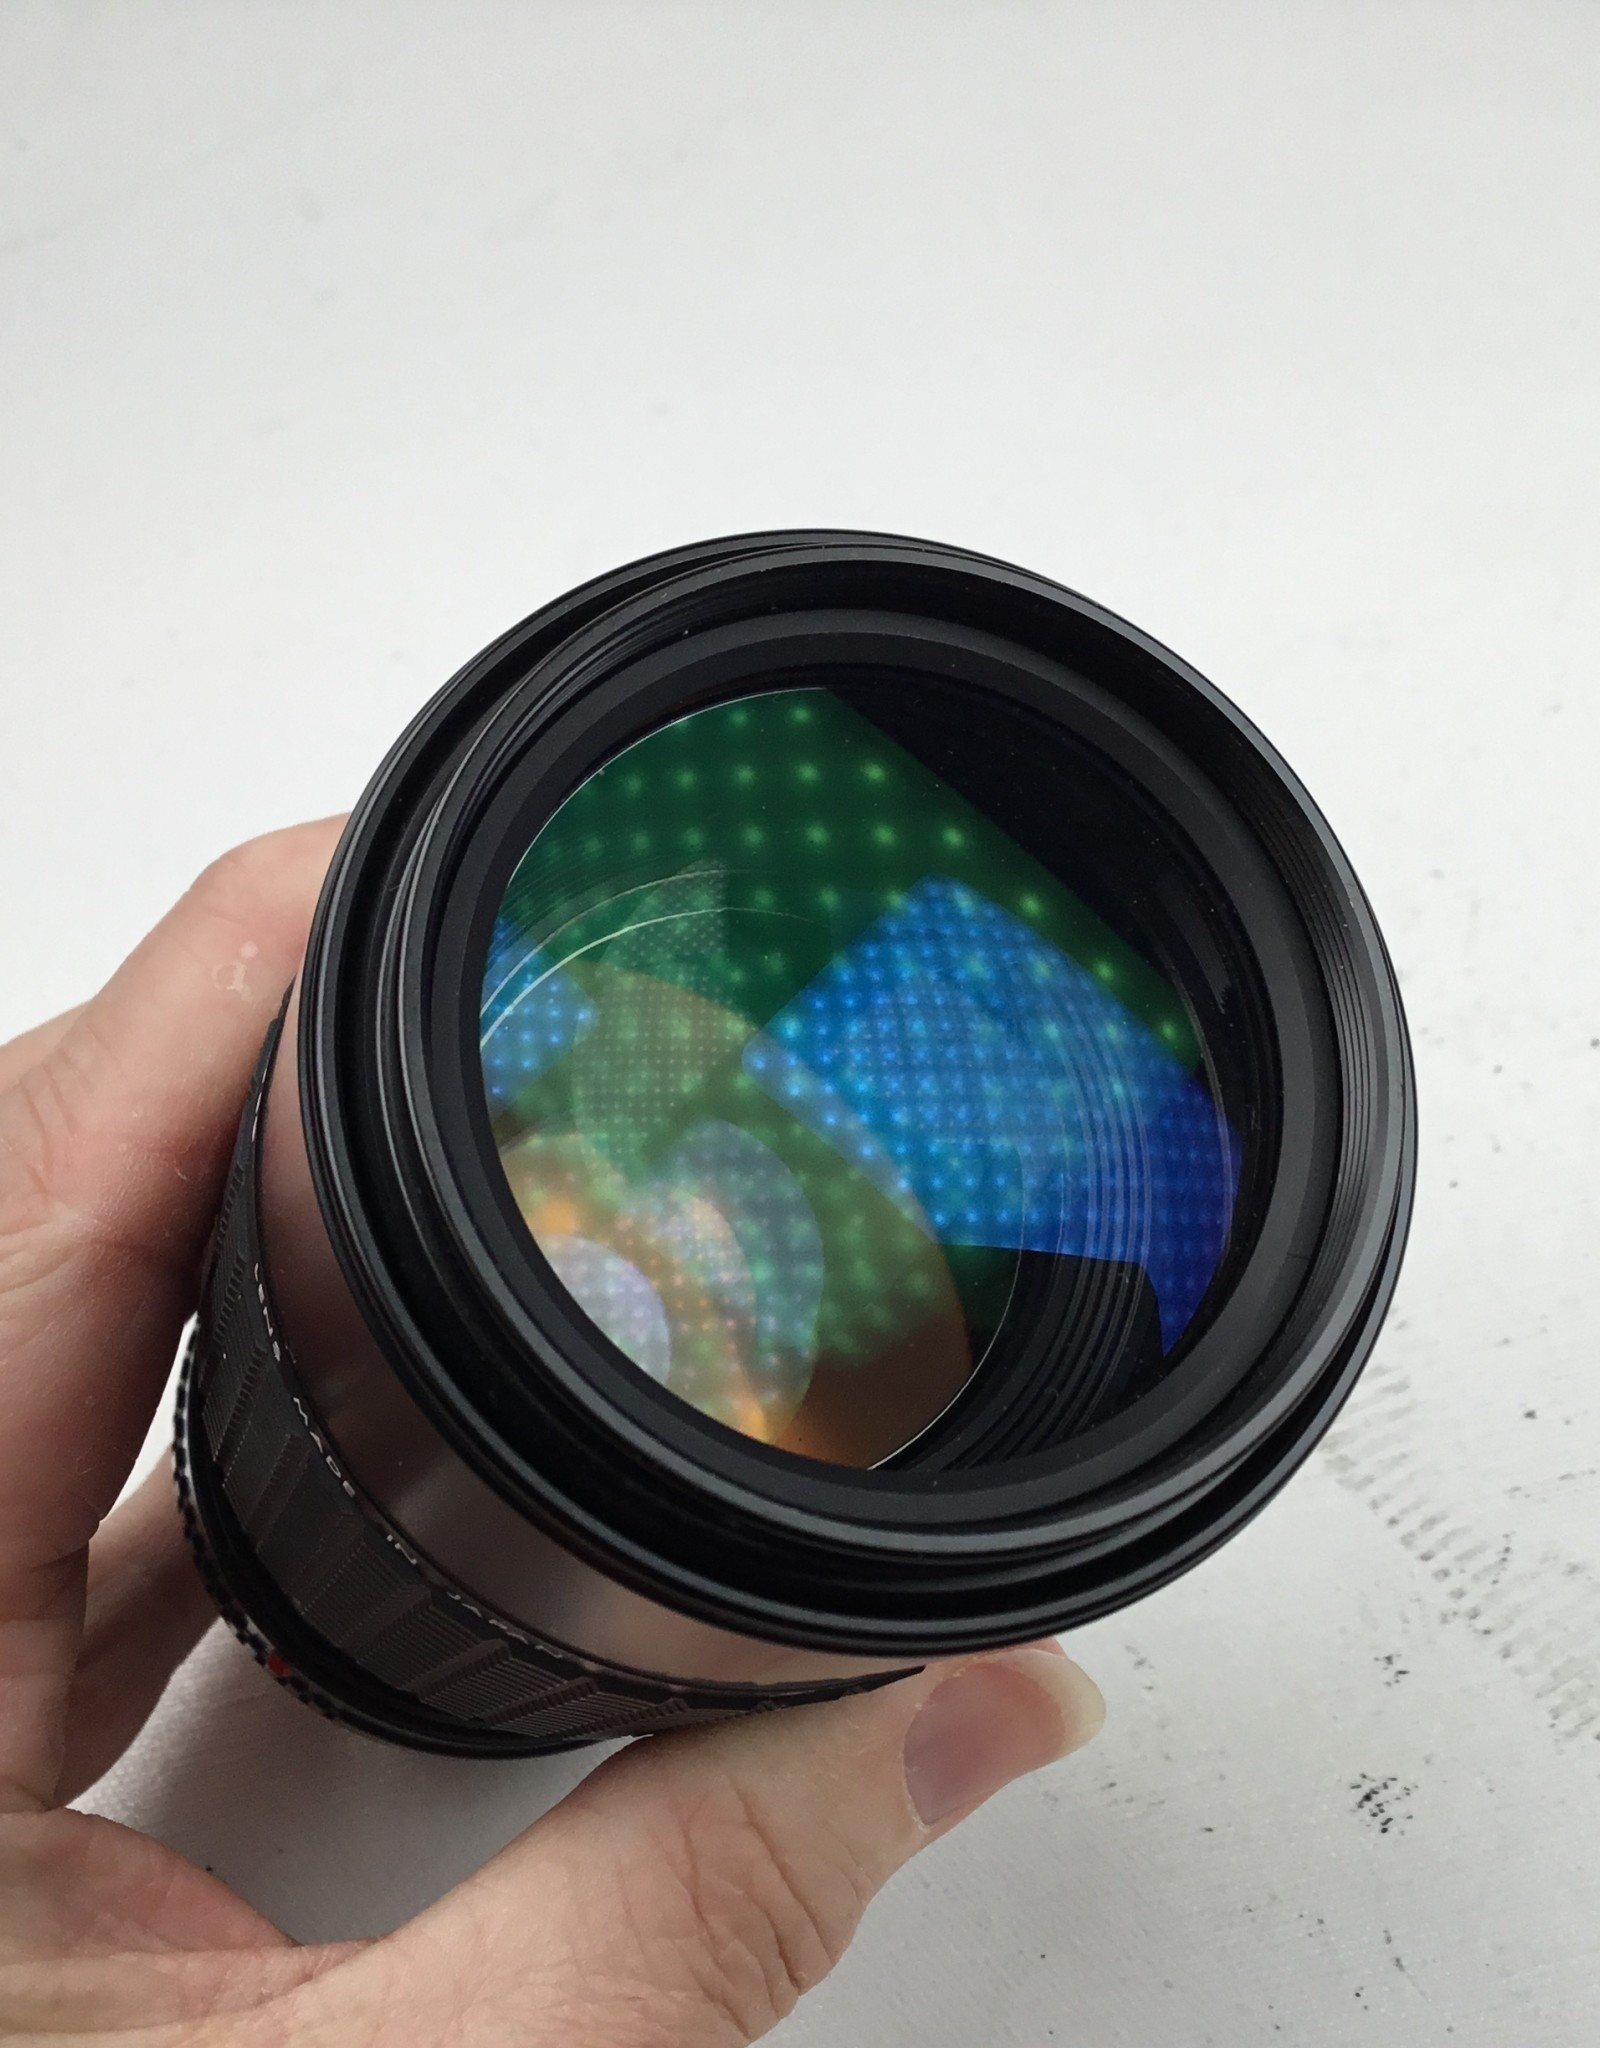 SIGMA Sigma 75-210mm f3.5-4.5 Lens for Minolta MD Used EX